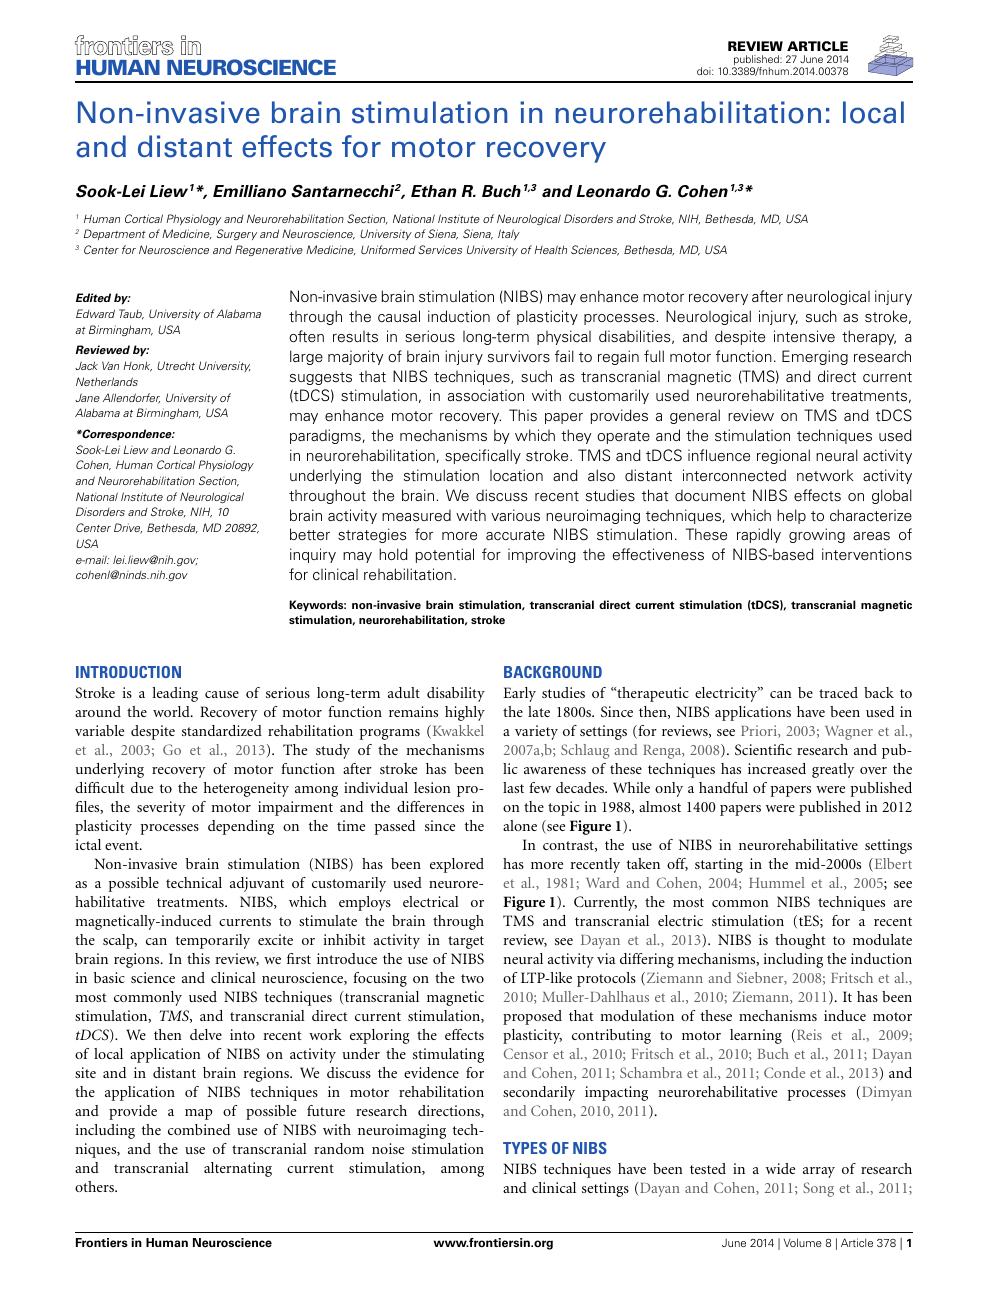 Non-invasive brain stimulation in neurorehabilitation: local and